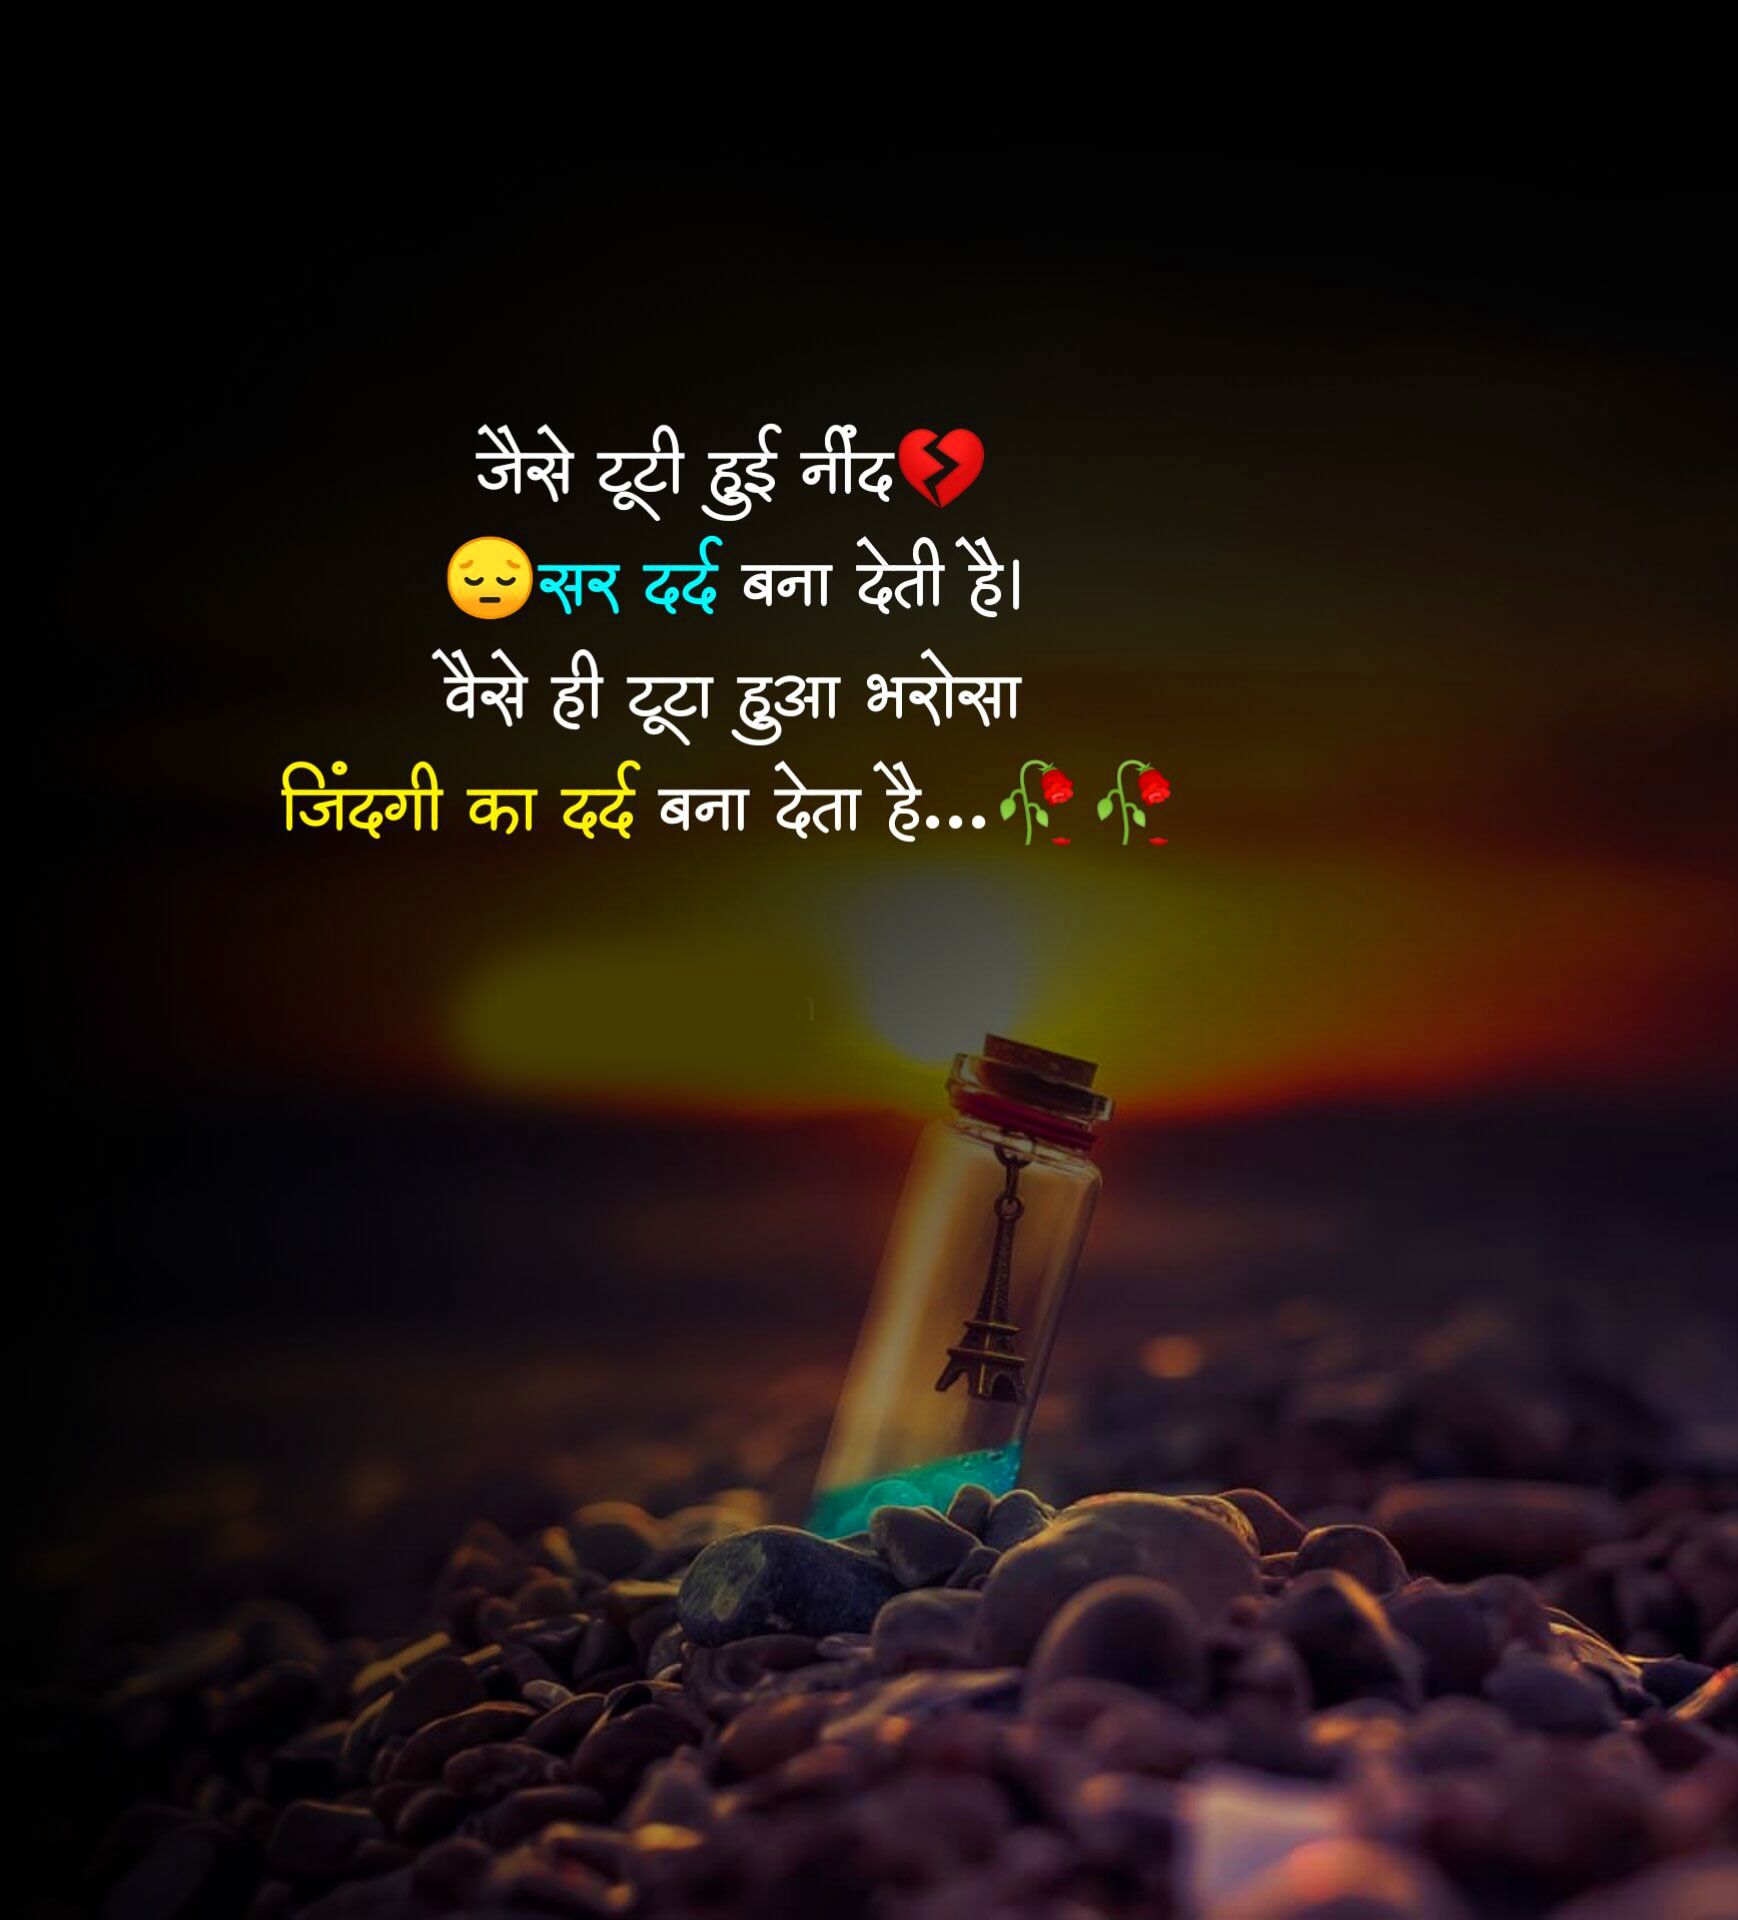 Latest Sad Boy Shayari Images for insta